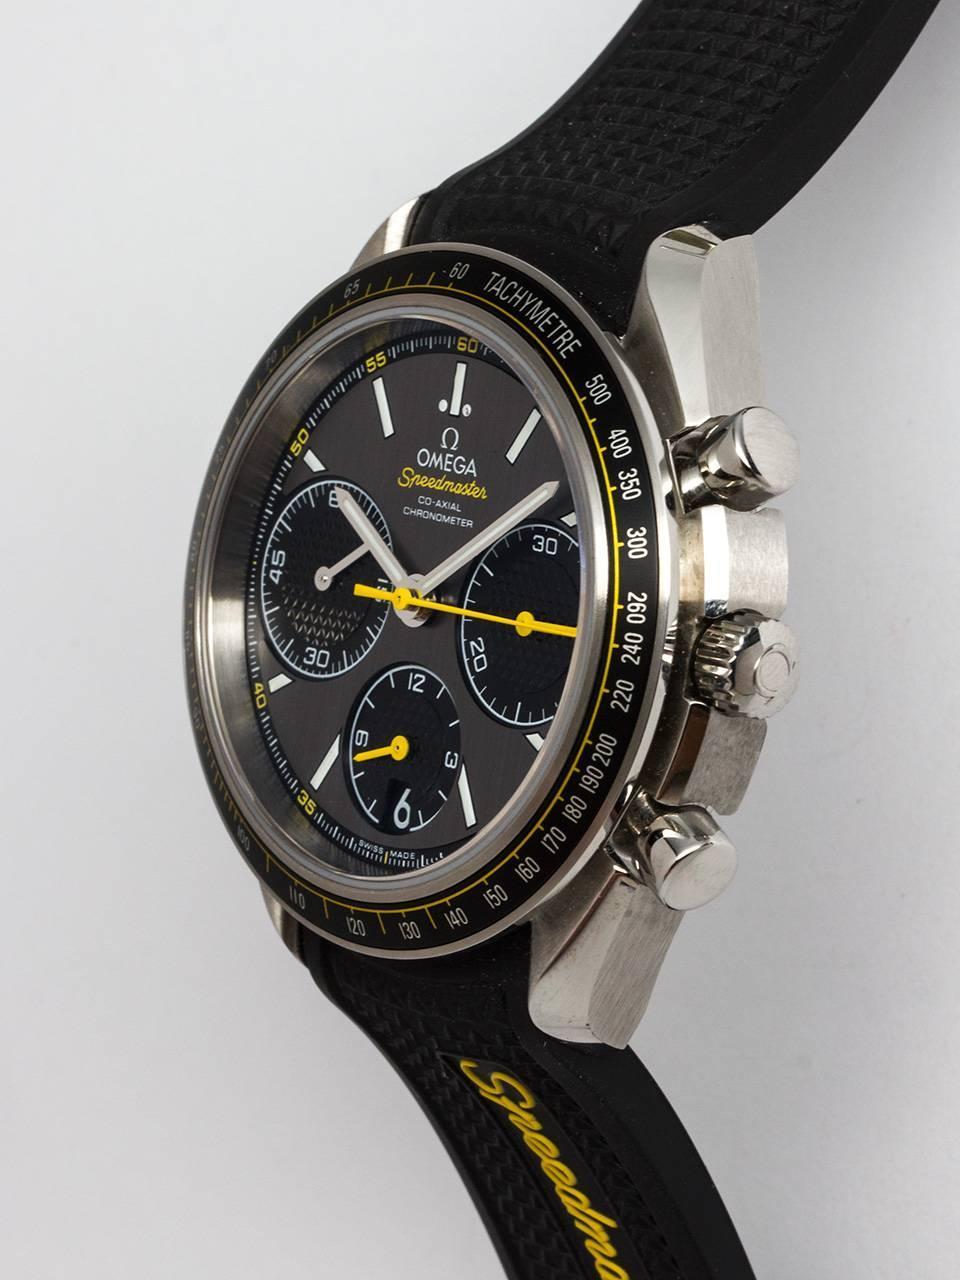 omega stainless steel speedmaster racing series wristwatch